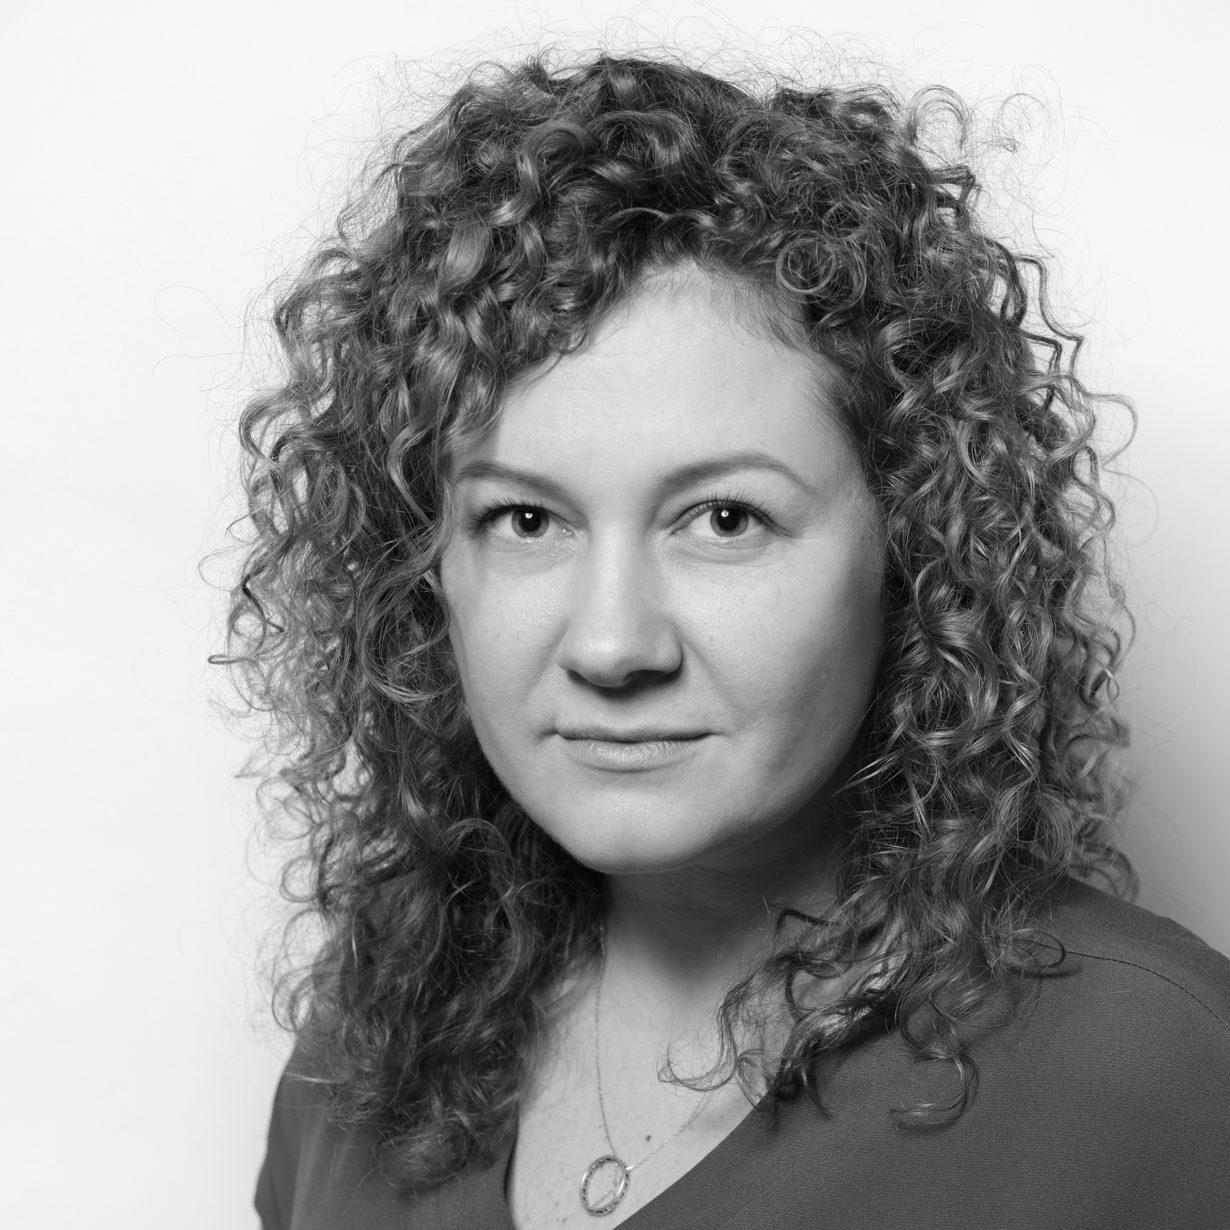 Anna Linowska